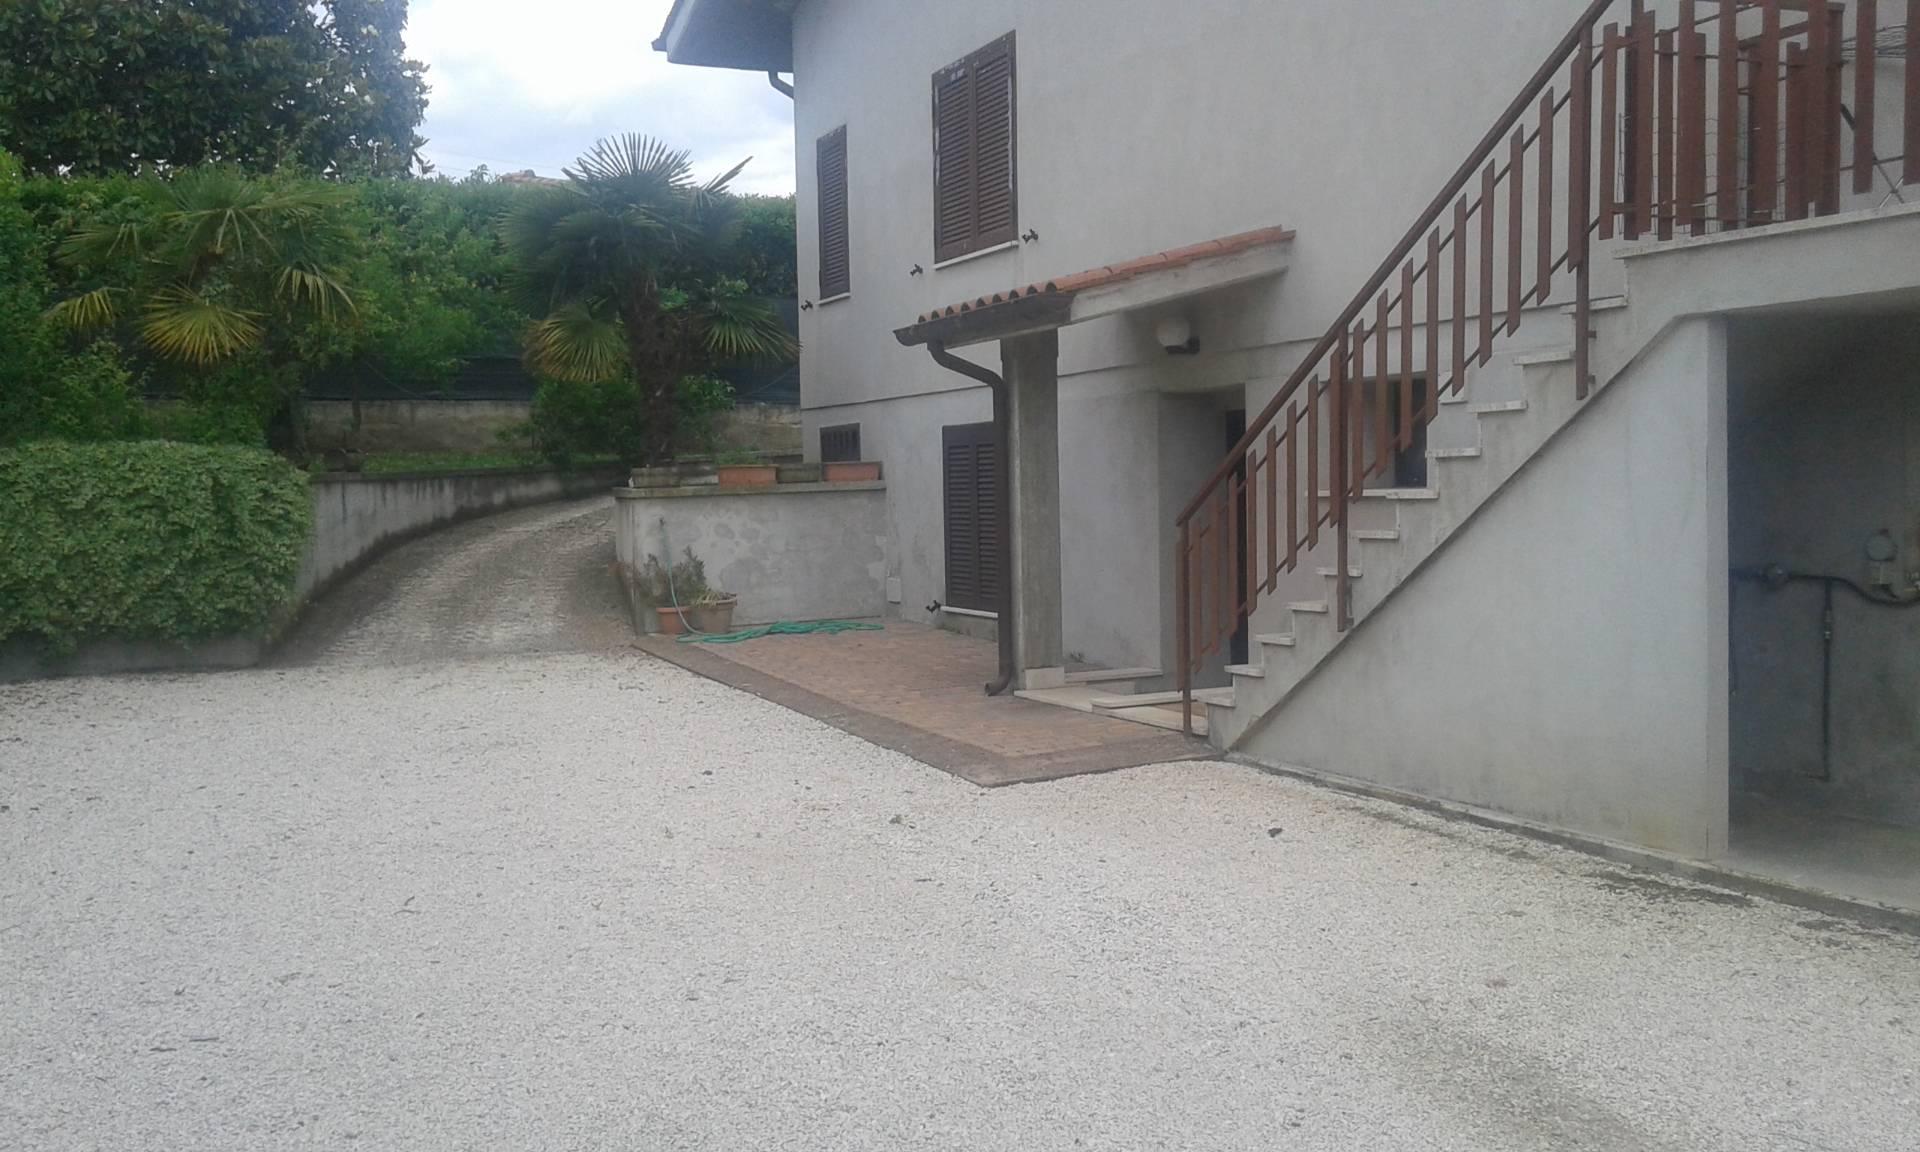 Bilocale Velletri Via Acqua Palomba 1